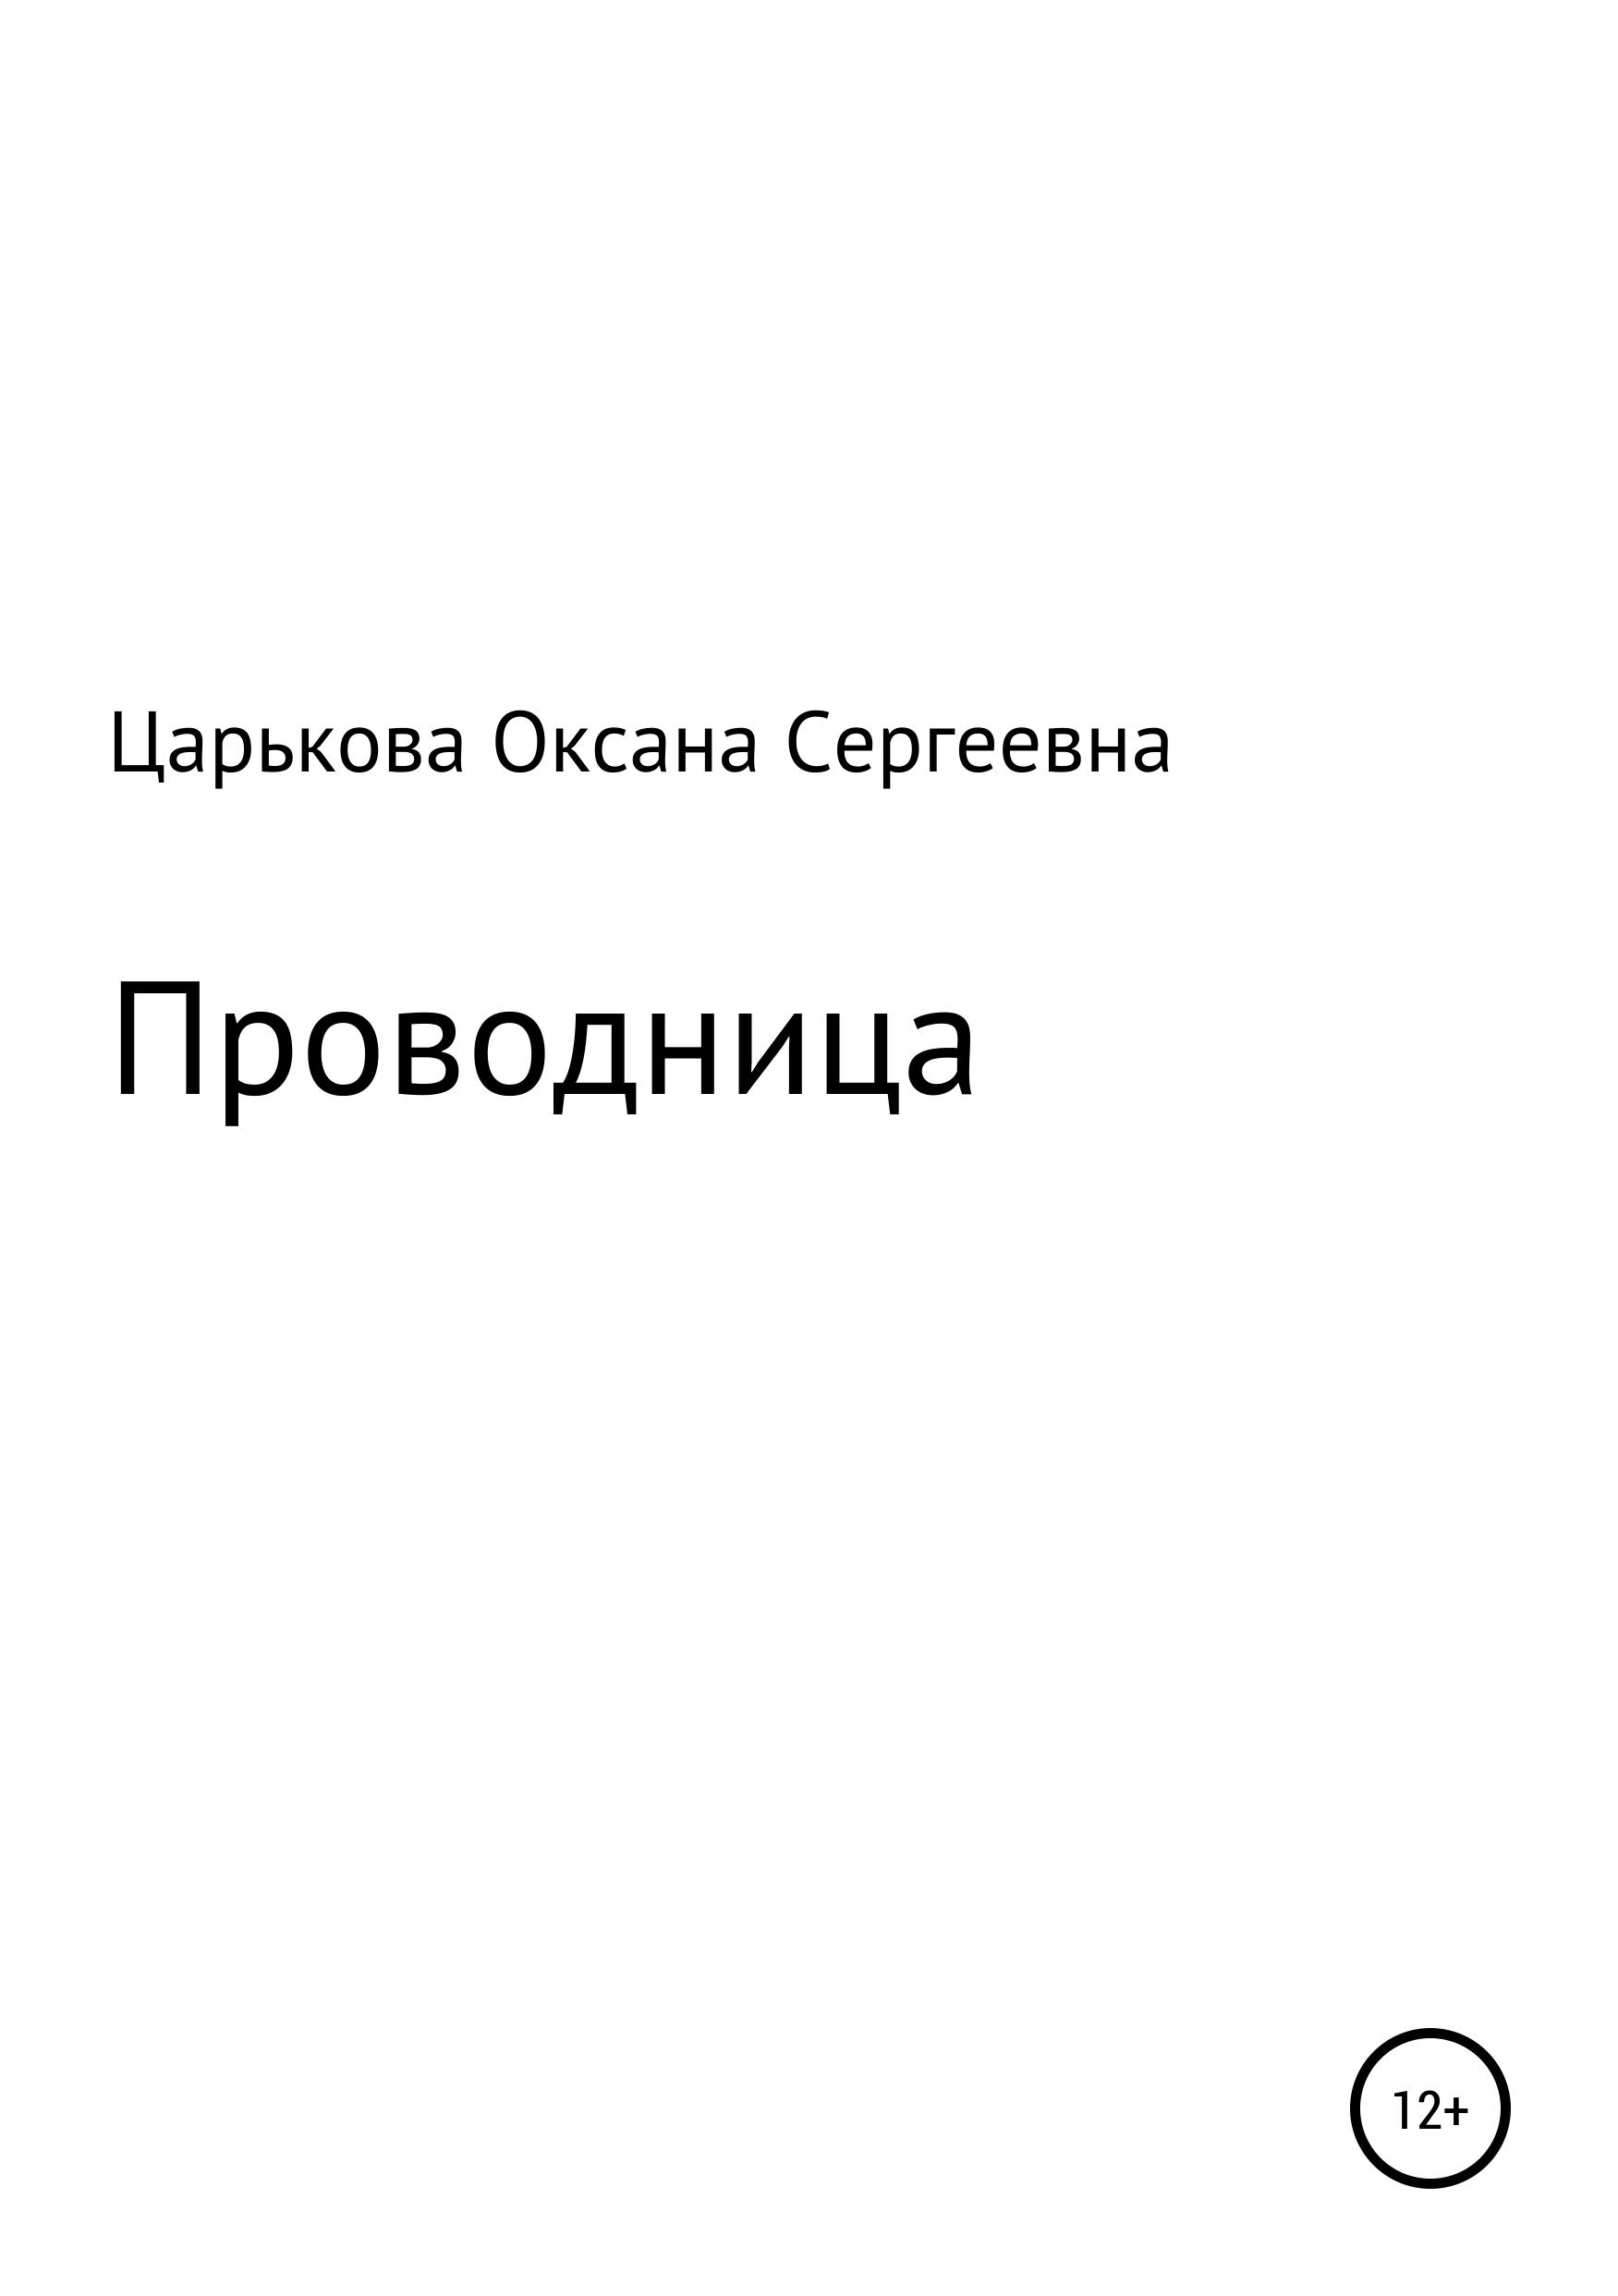 Оксана Сергеевна Царькова Проводница